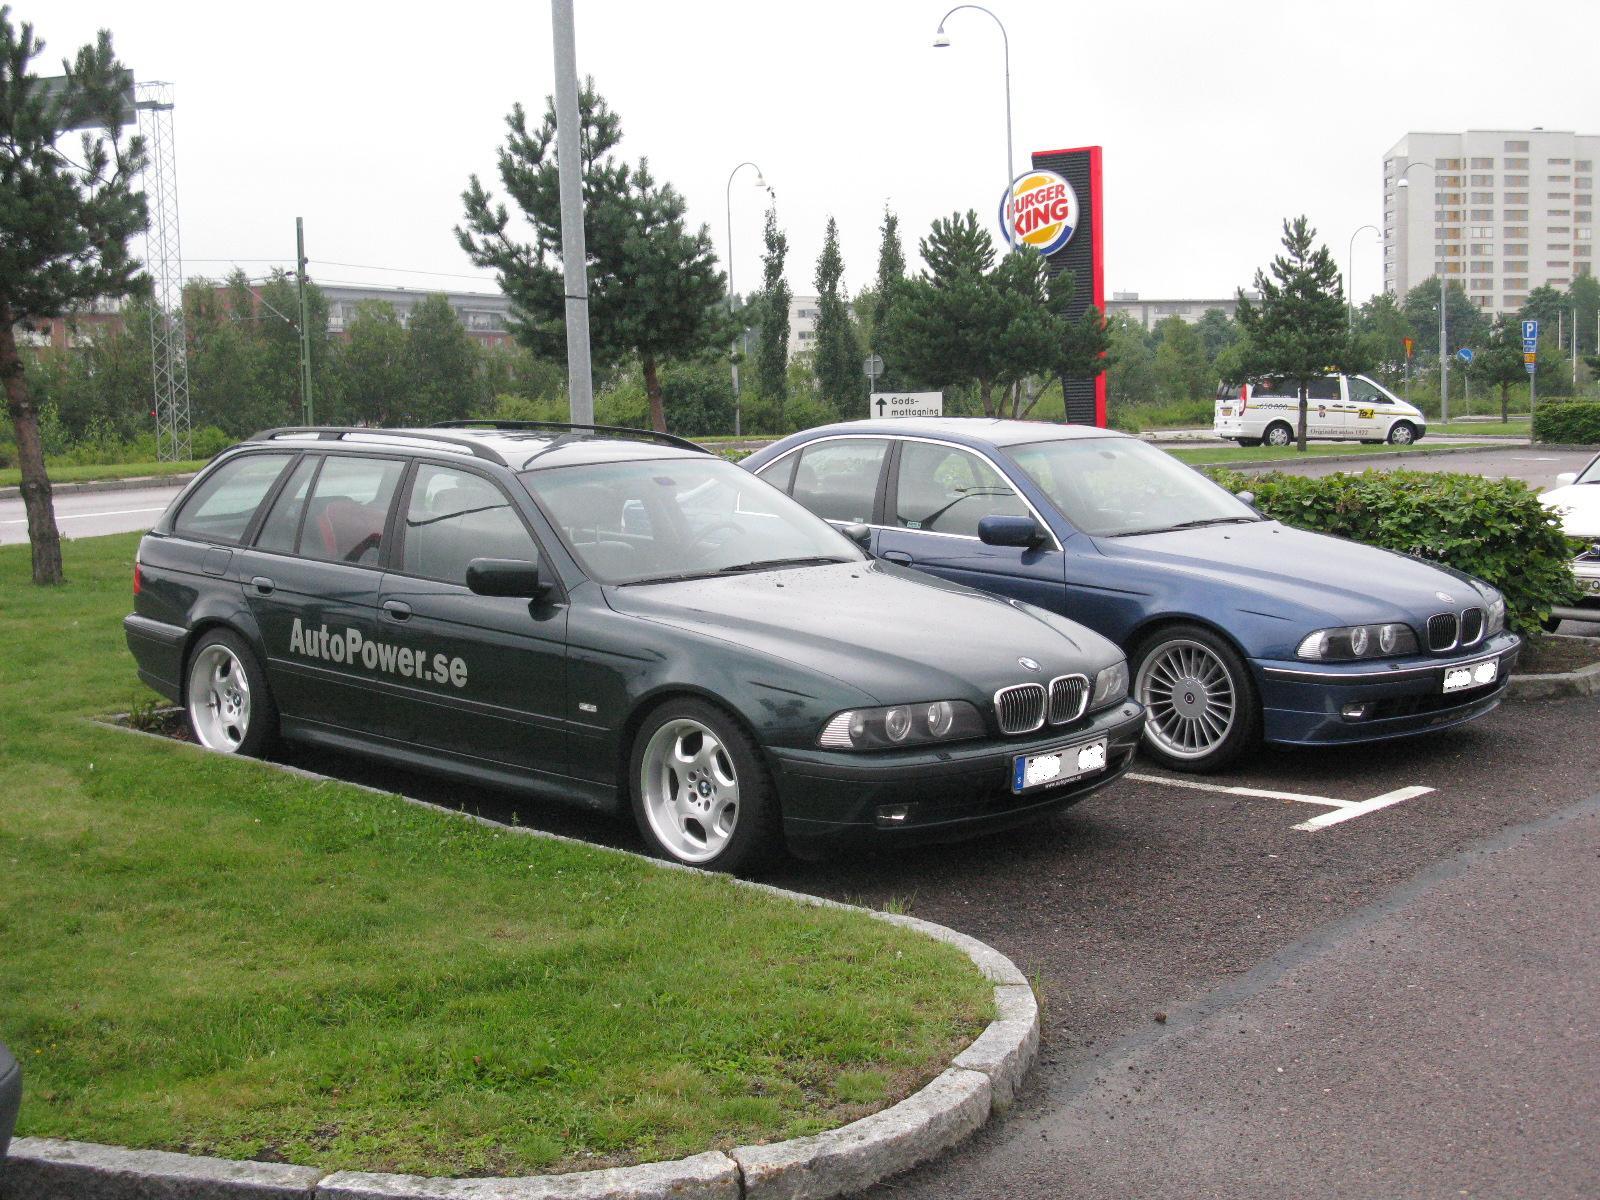 File Bmw 540i Touring Bmw Alpina B10 V8 E39 6012566727 Jpg Wikimedia Commons